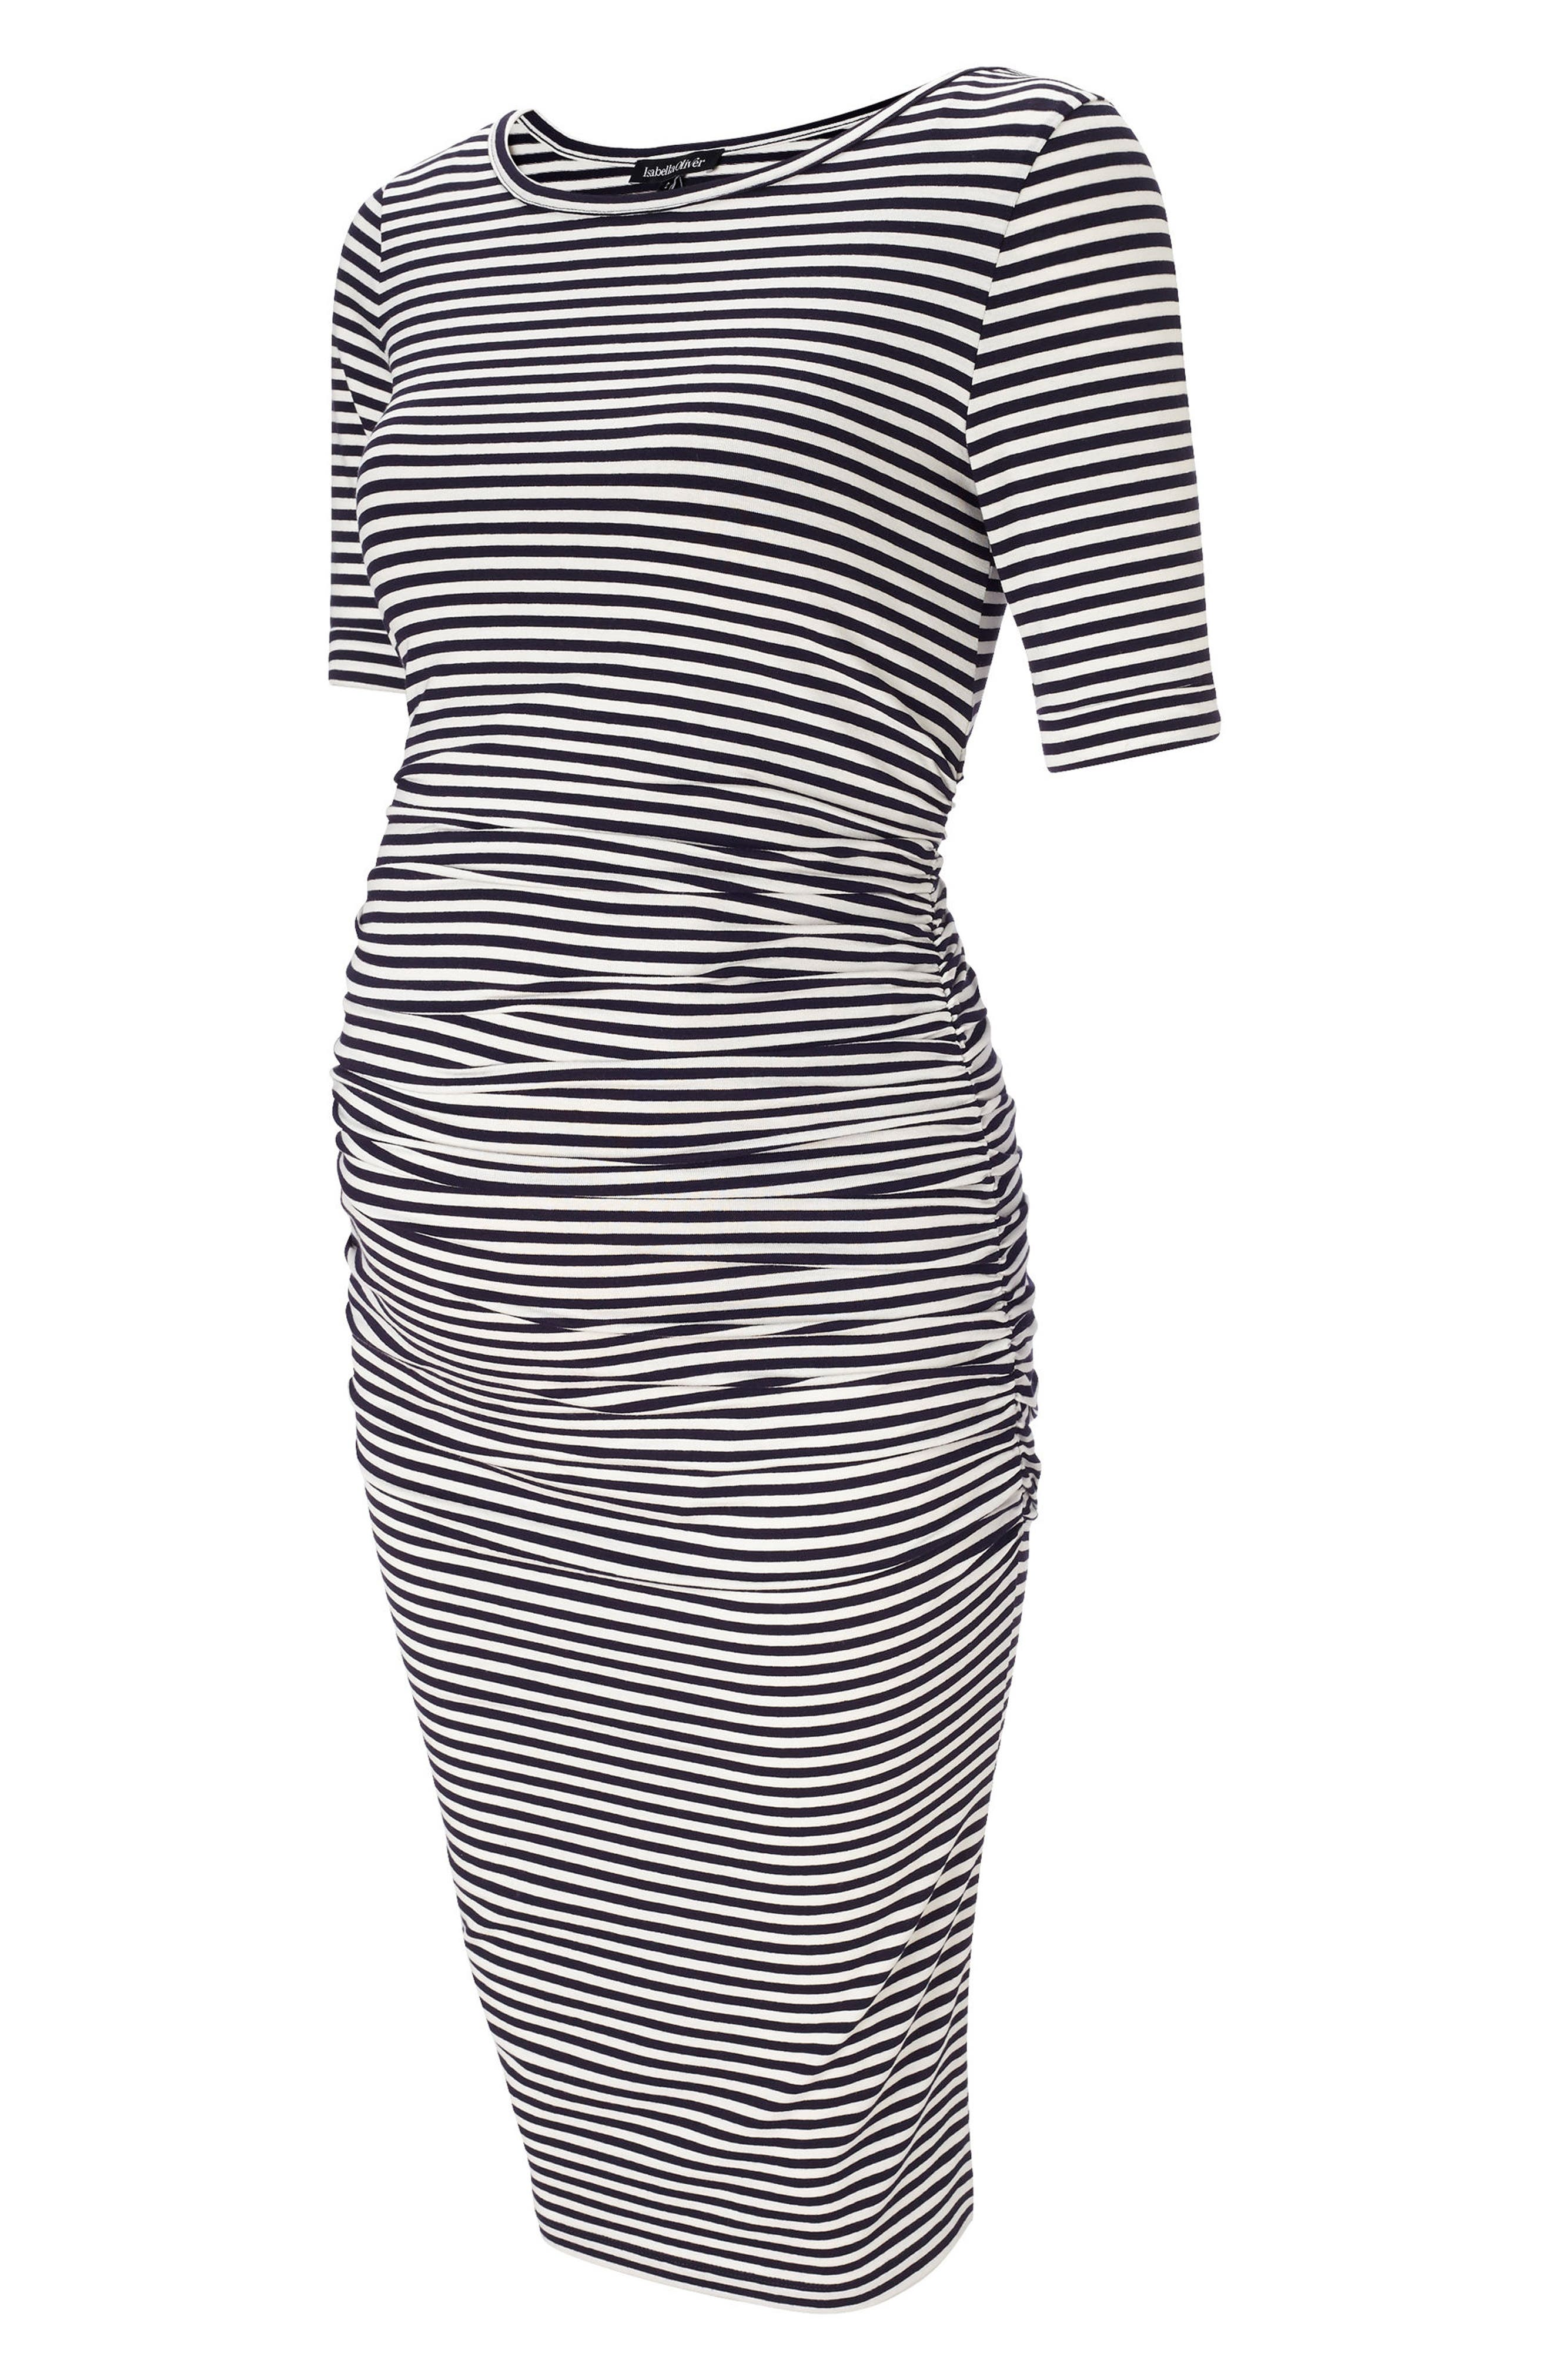 Arlington Stripe Maternity Dress